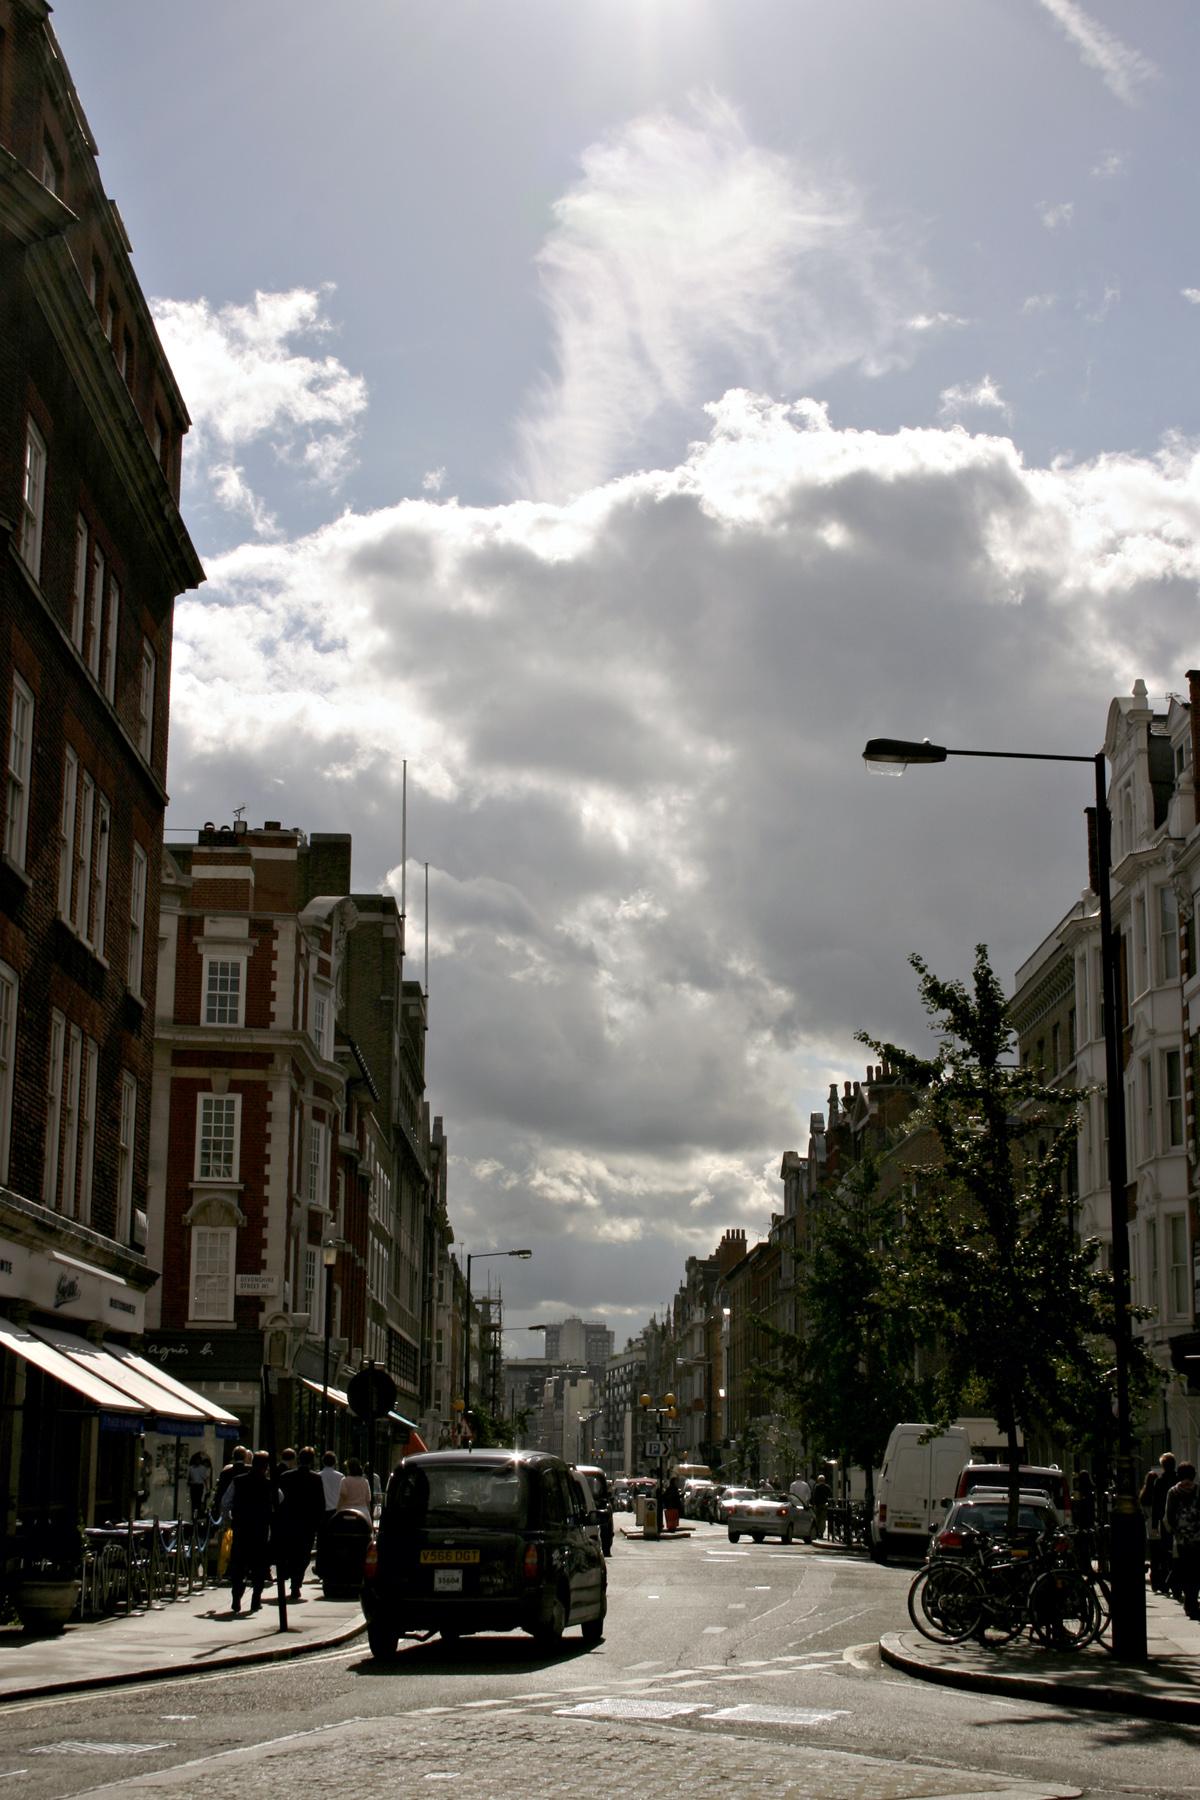 Busy London Street, Buildings, Cab, Cars, City, HQ Photo